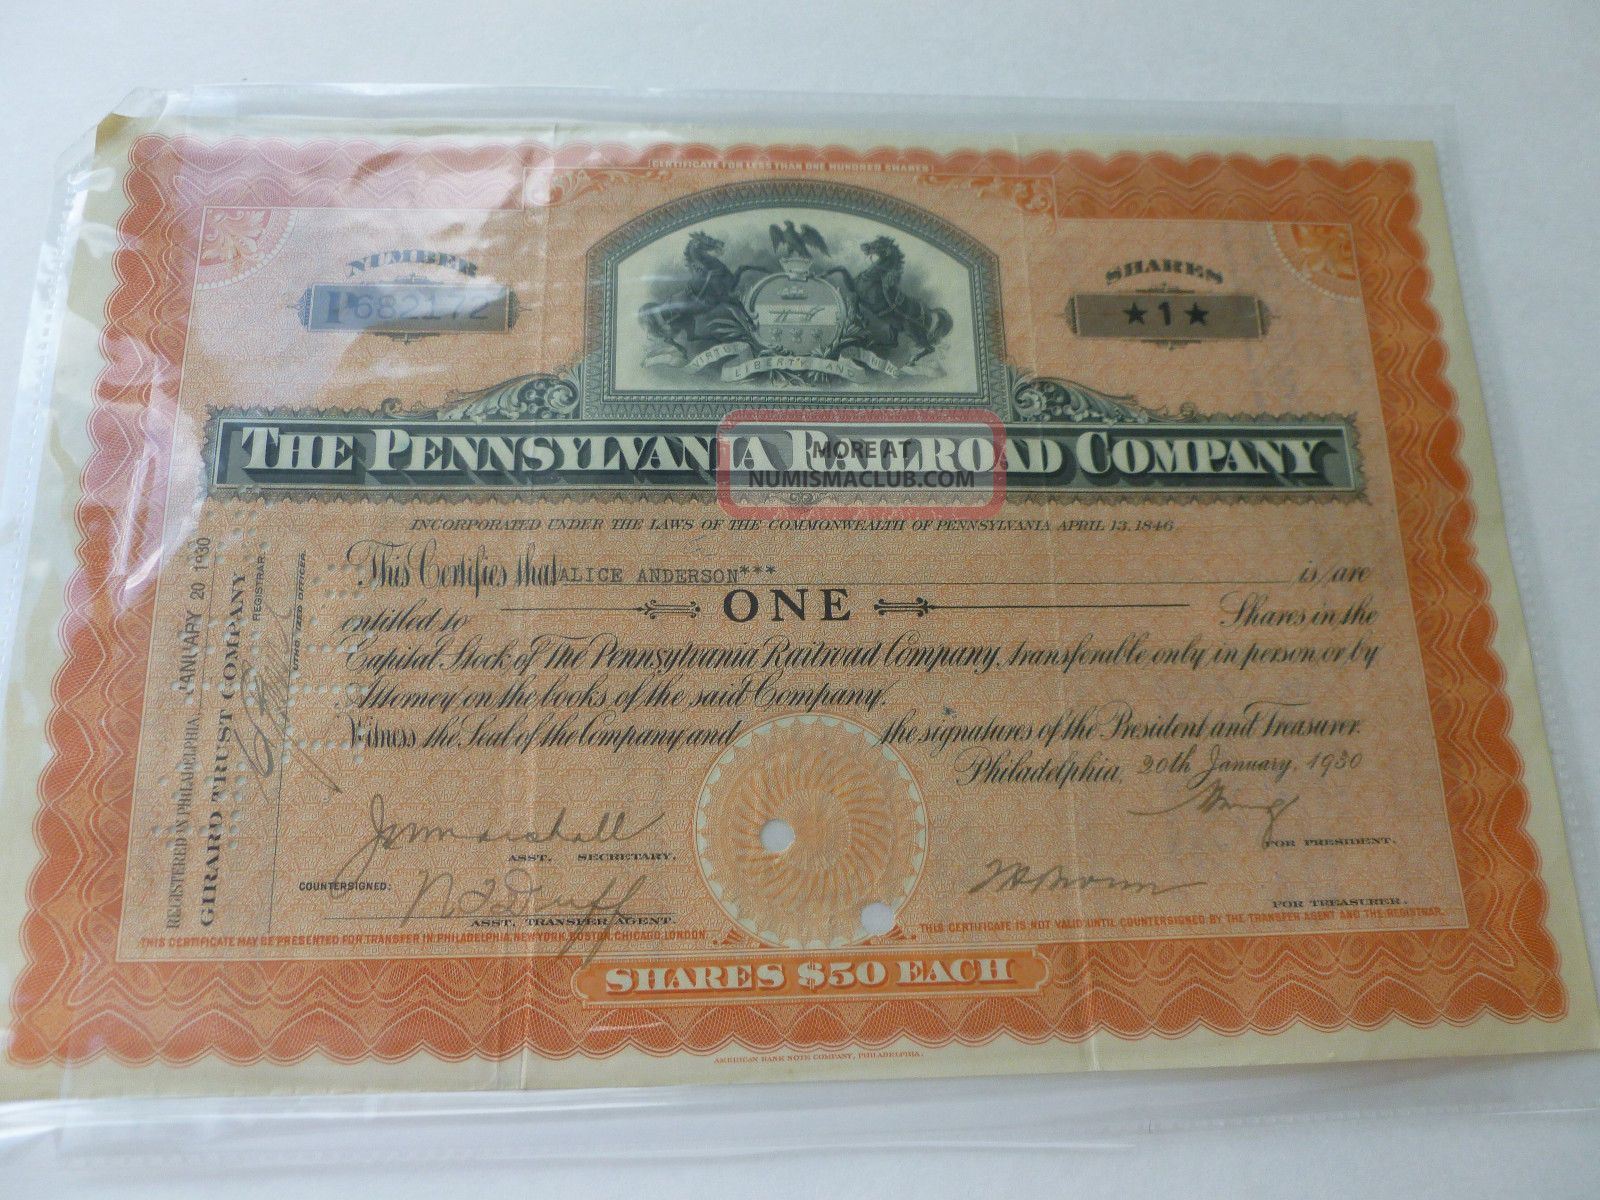 1930 Pennsylvania Railroad Company Stock Certificate - One Share Transportation photo